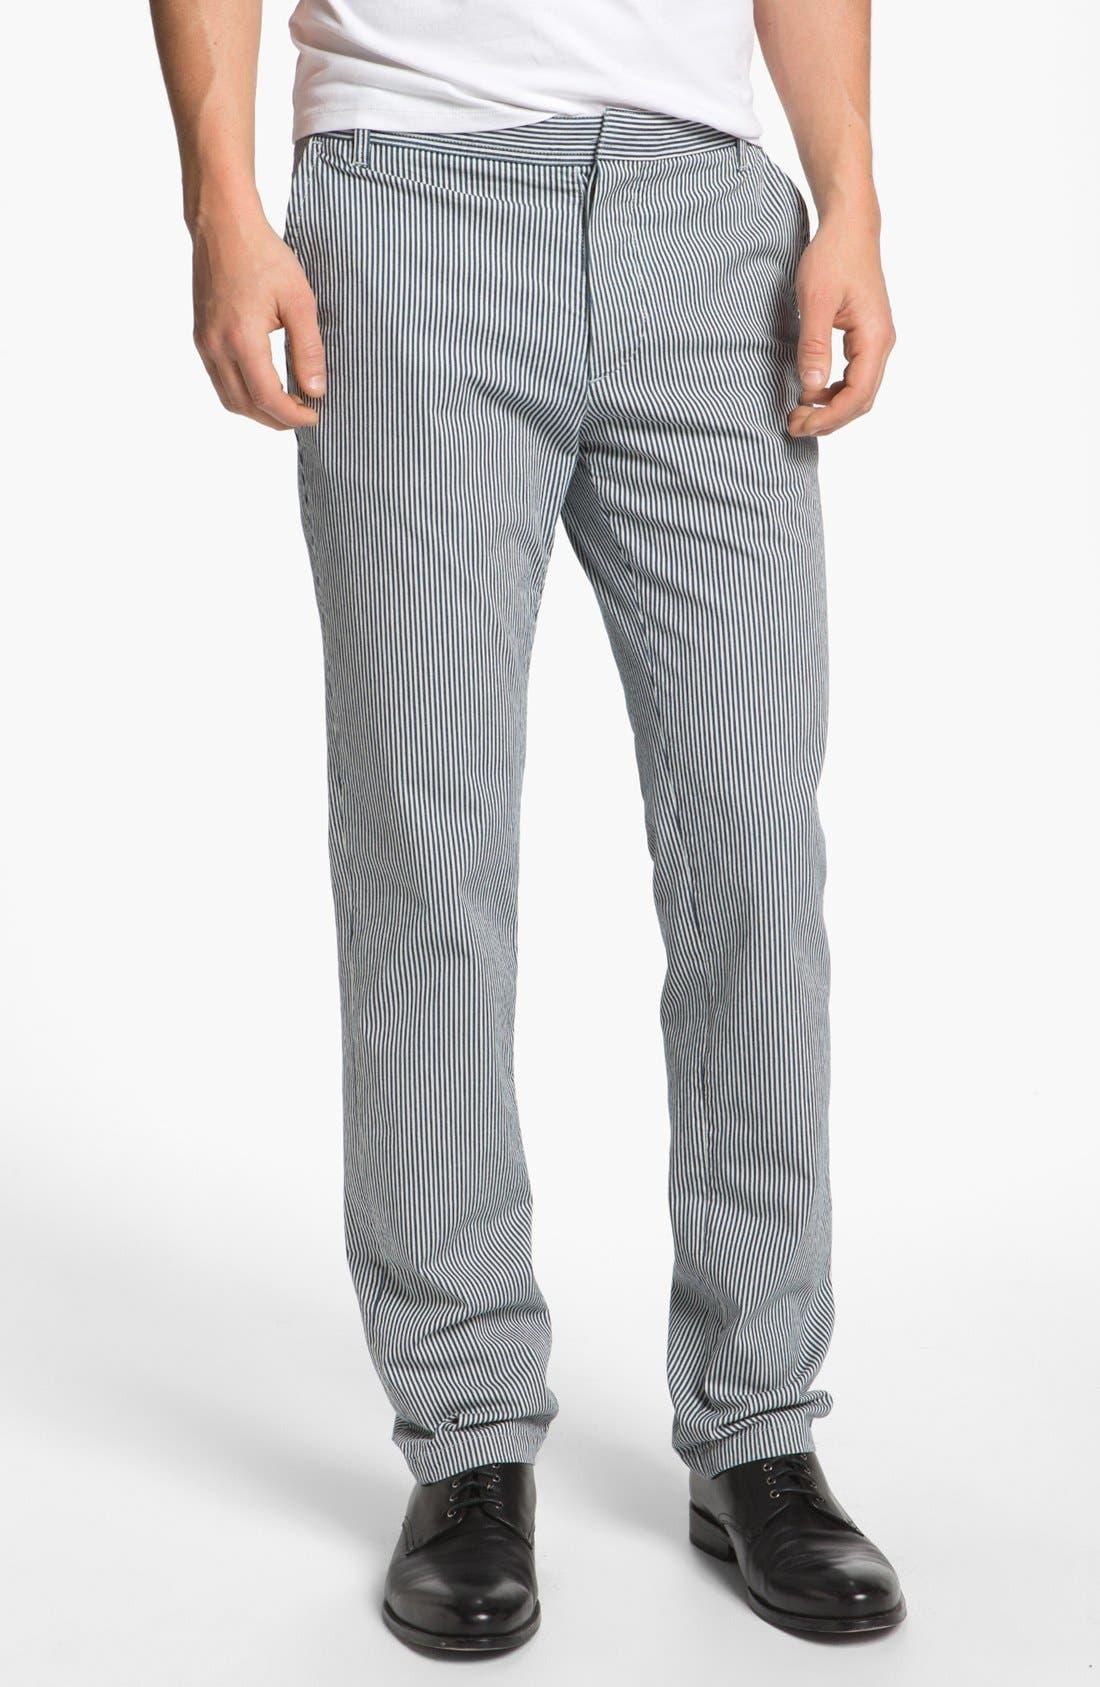 Main Image - A.P.C. 'New Chino' Stripe Pants